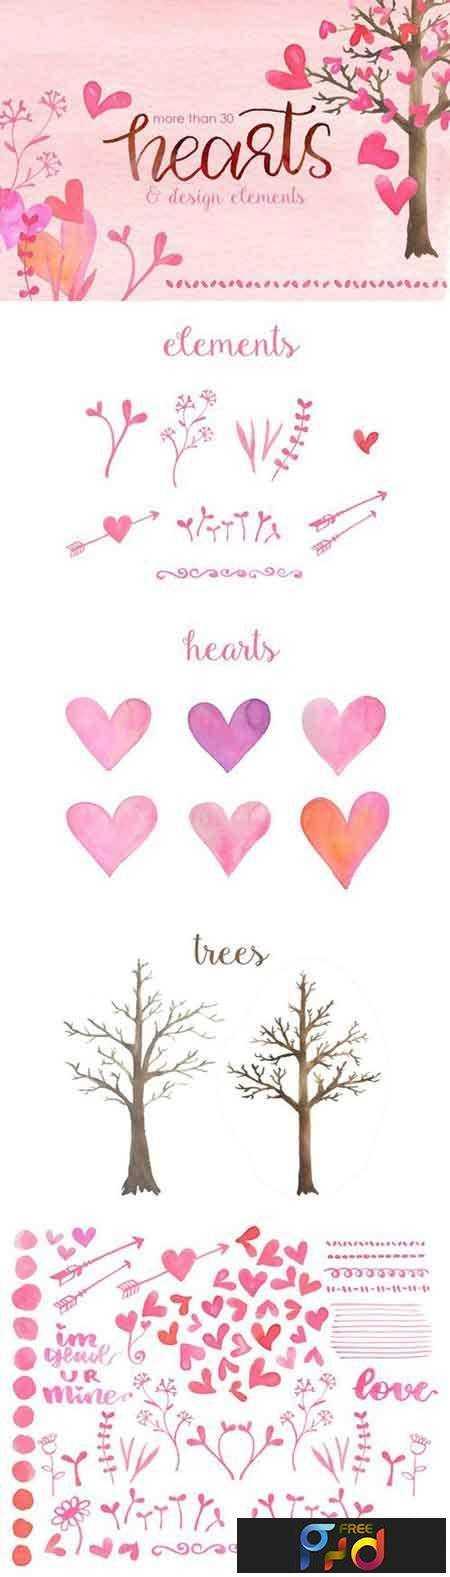 1804252 WaterColor Hearts & Design Elements 2231481 1